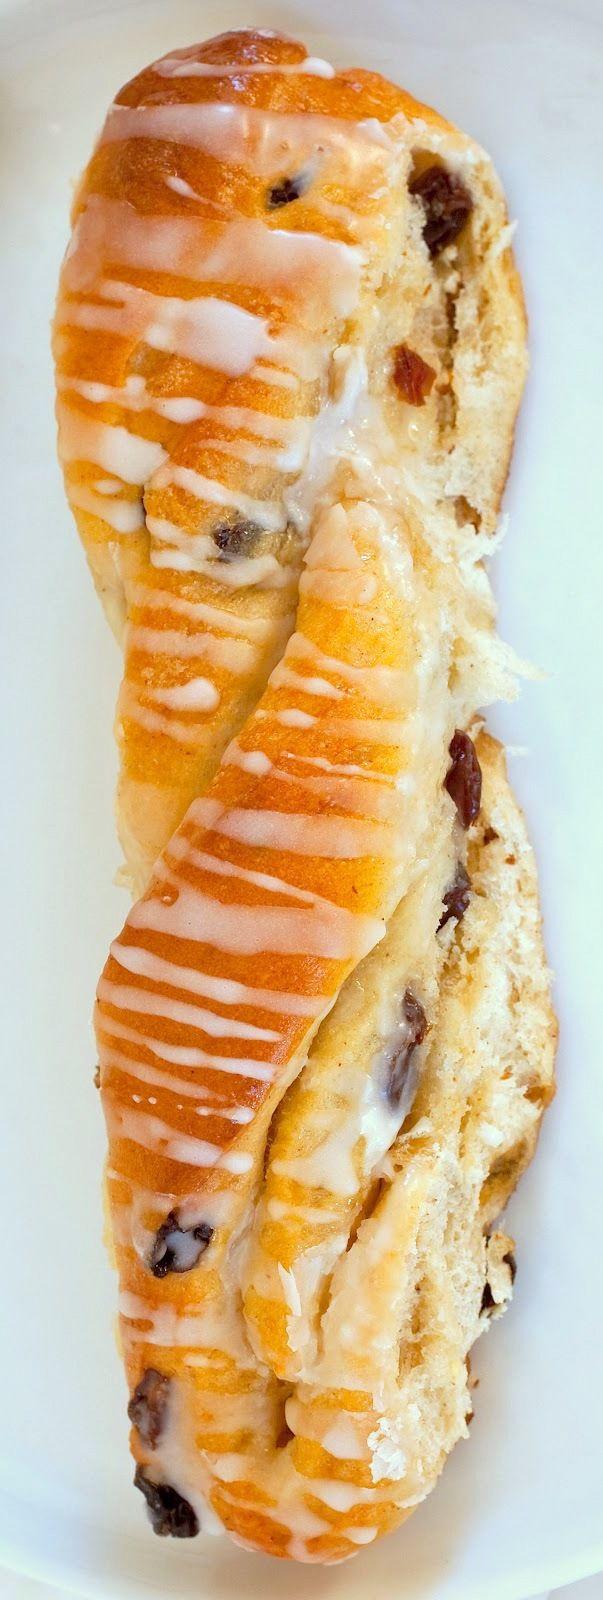 Cinnamon Raisin Twists | Breads & Muffins | Pinterest